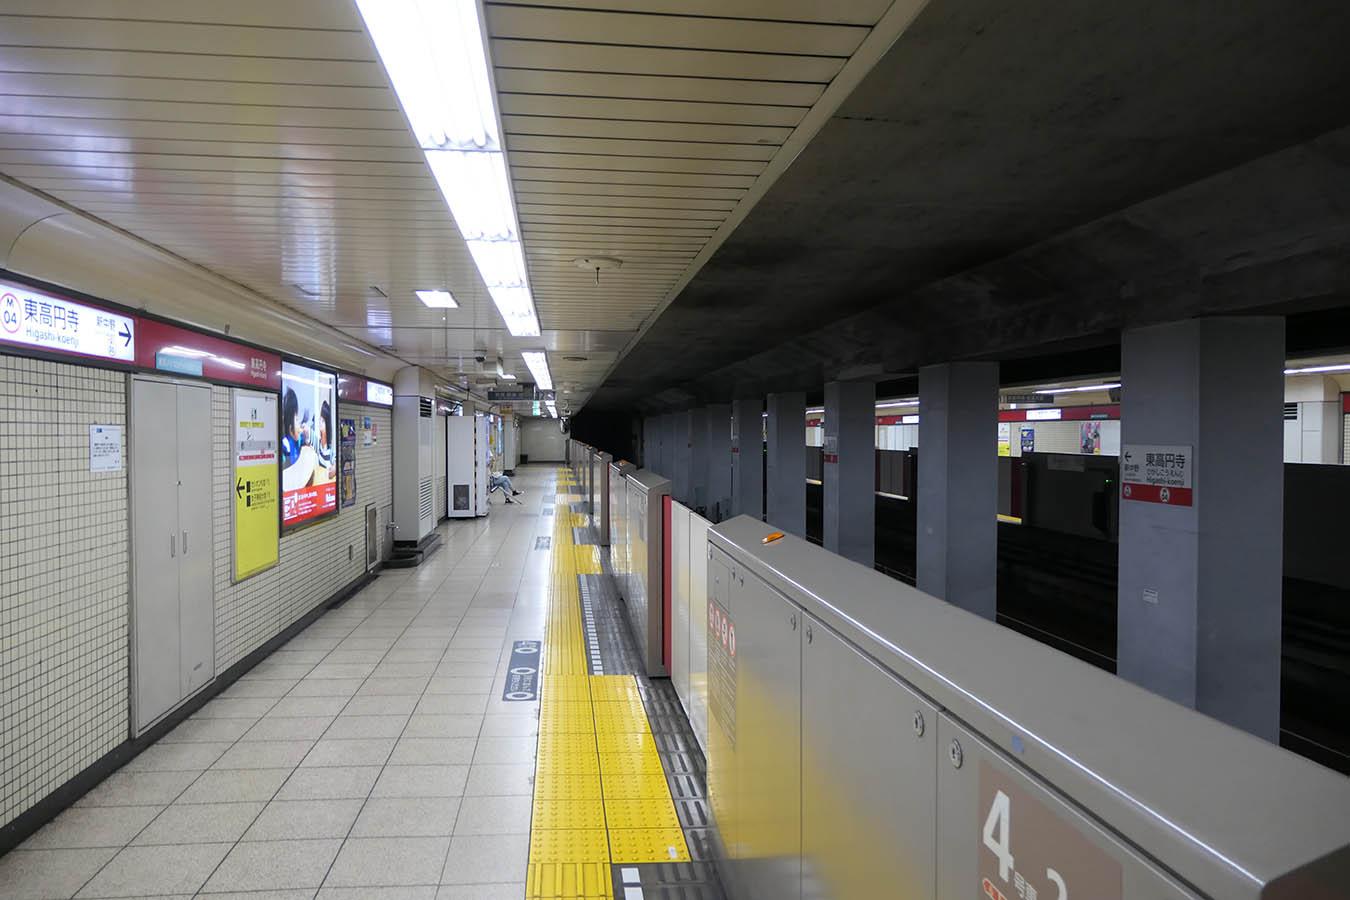 M04_photo02.jpg